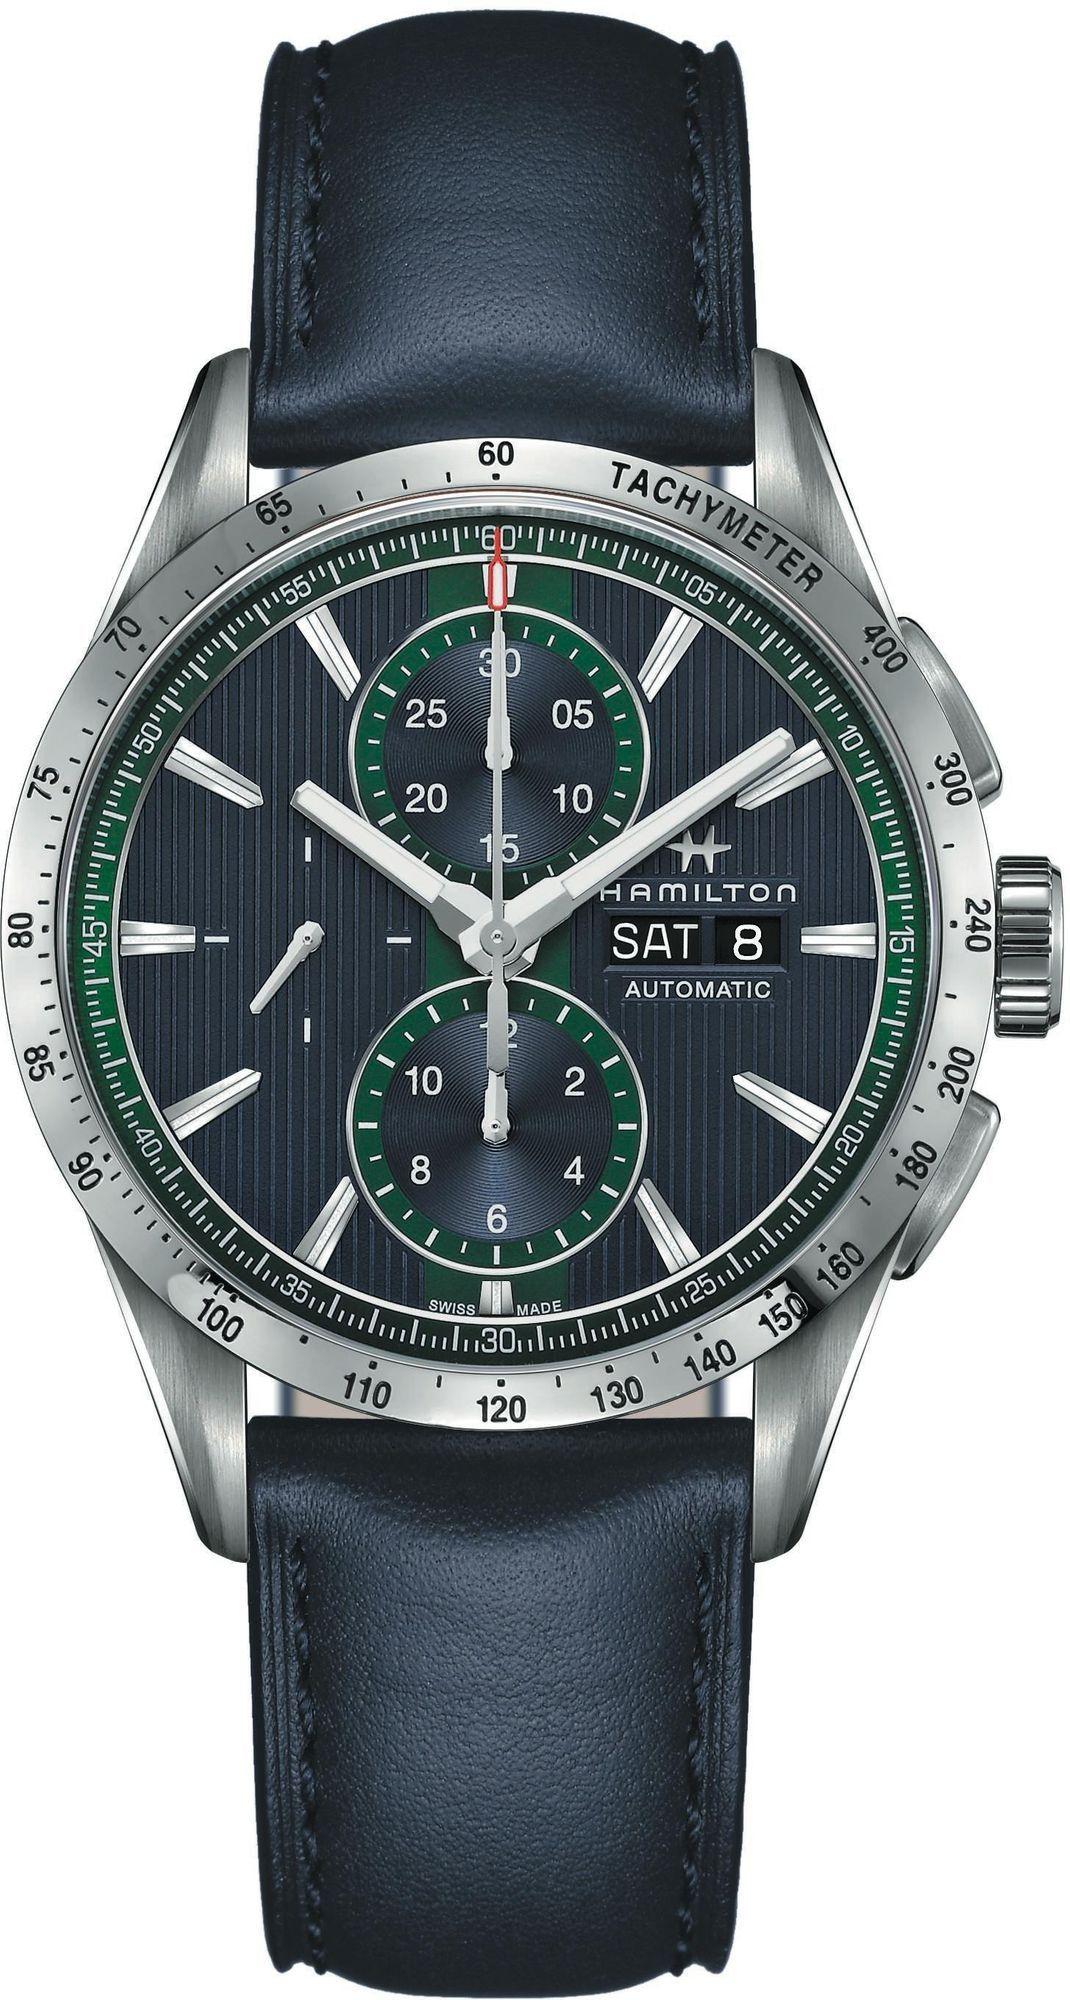 Hamilton Broadway Day-Date Automatikuhr Chronograph - Kal. H21 (präzises Valjoux 7750) - 43mm - Swiss Made